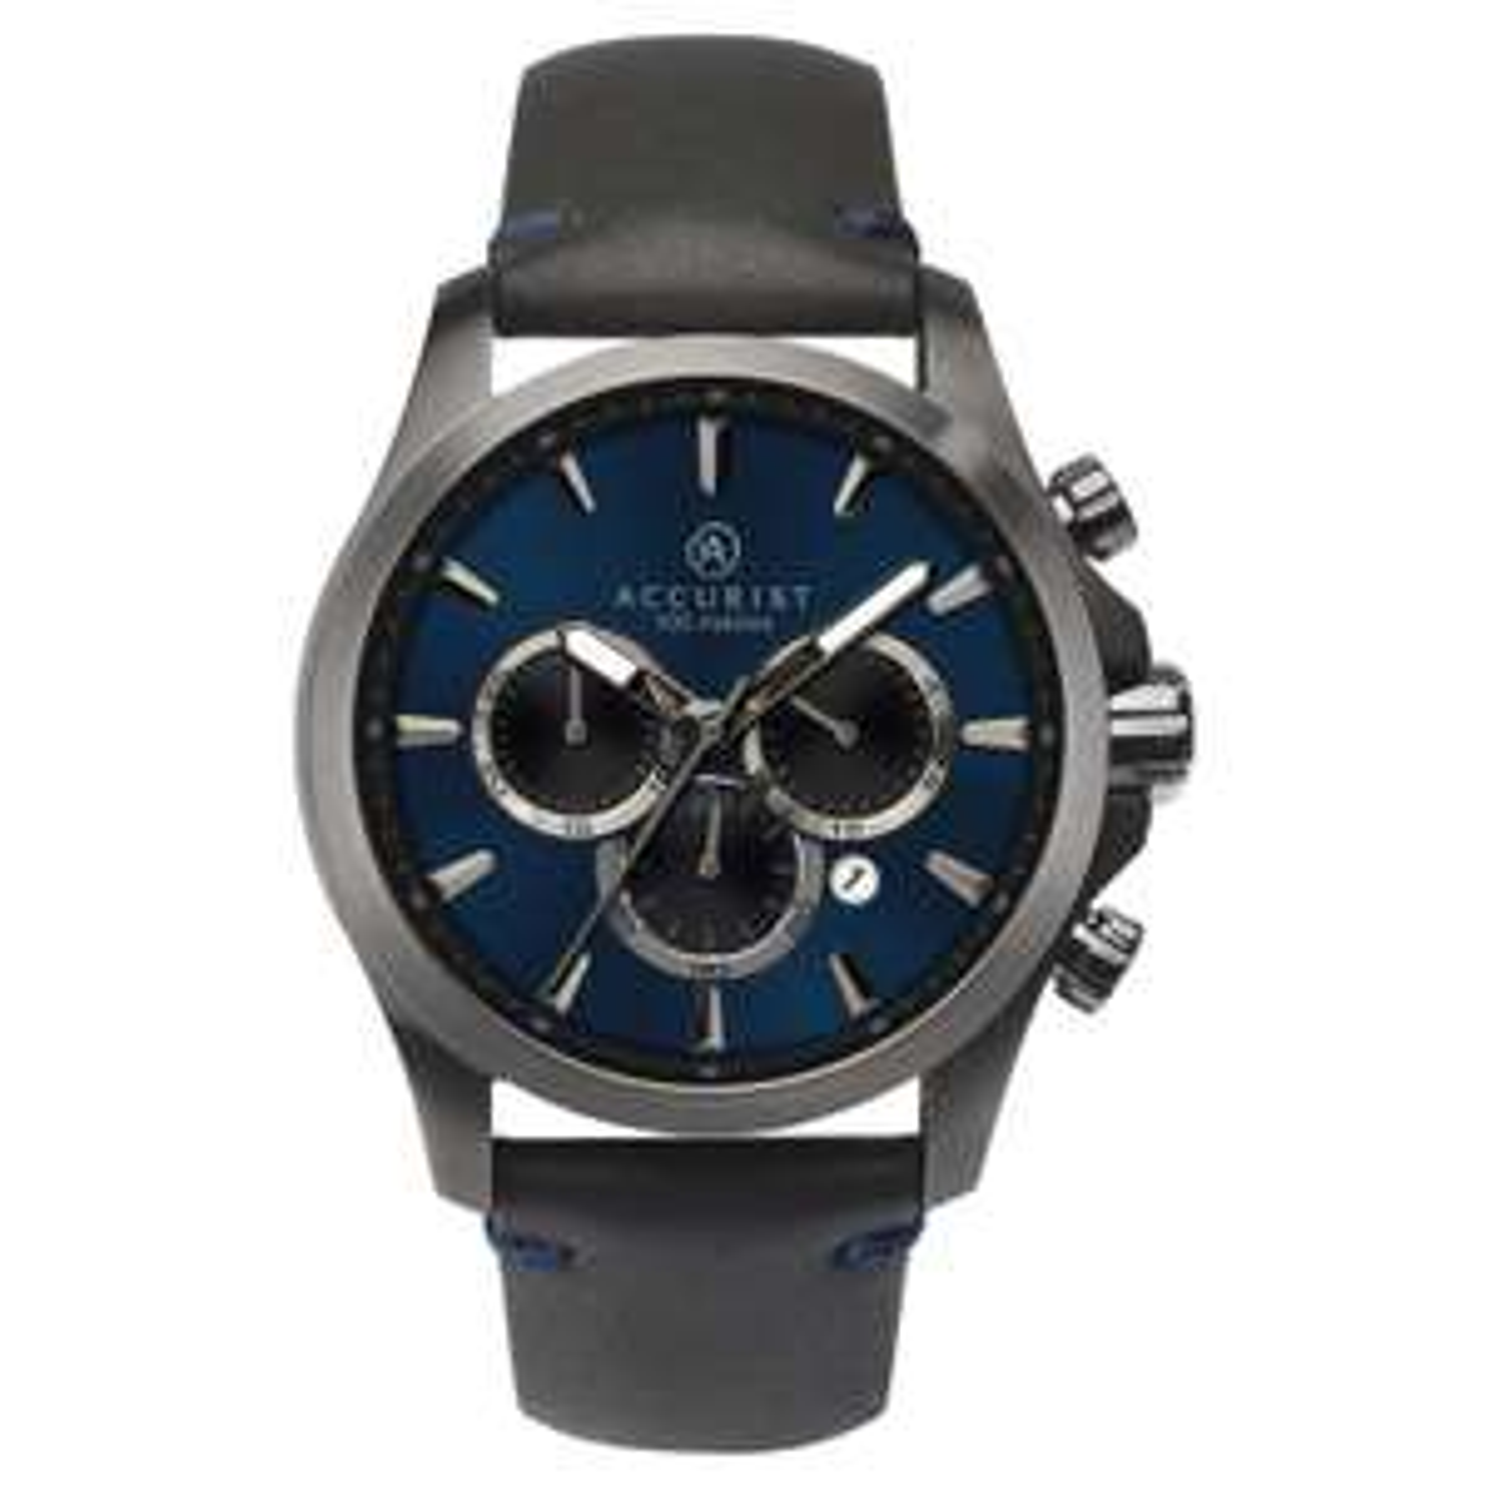 Accurist Chronograph Men's Black Leather Strap Watch £62.99 delivered @ H Samuel